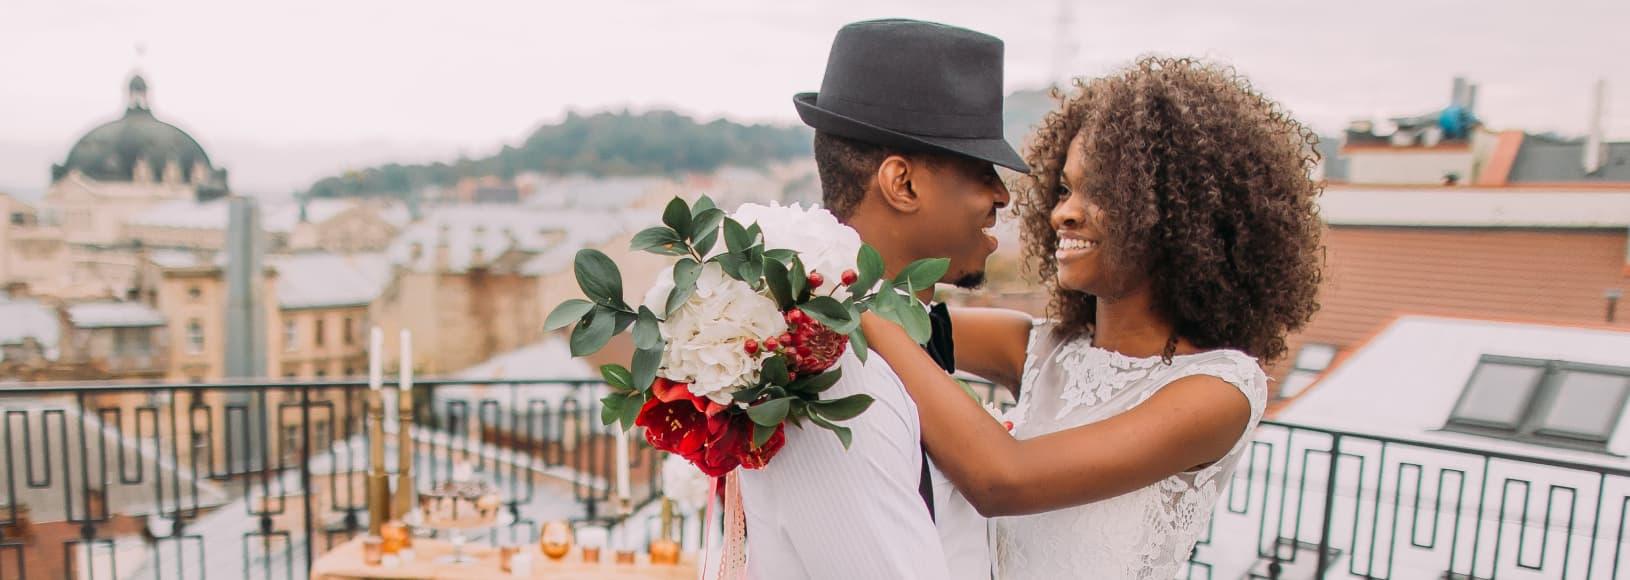 Fotógrafos para el matrimonio